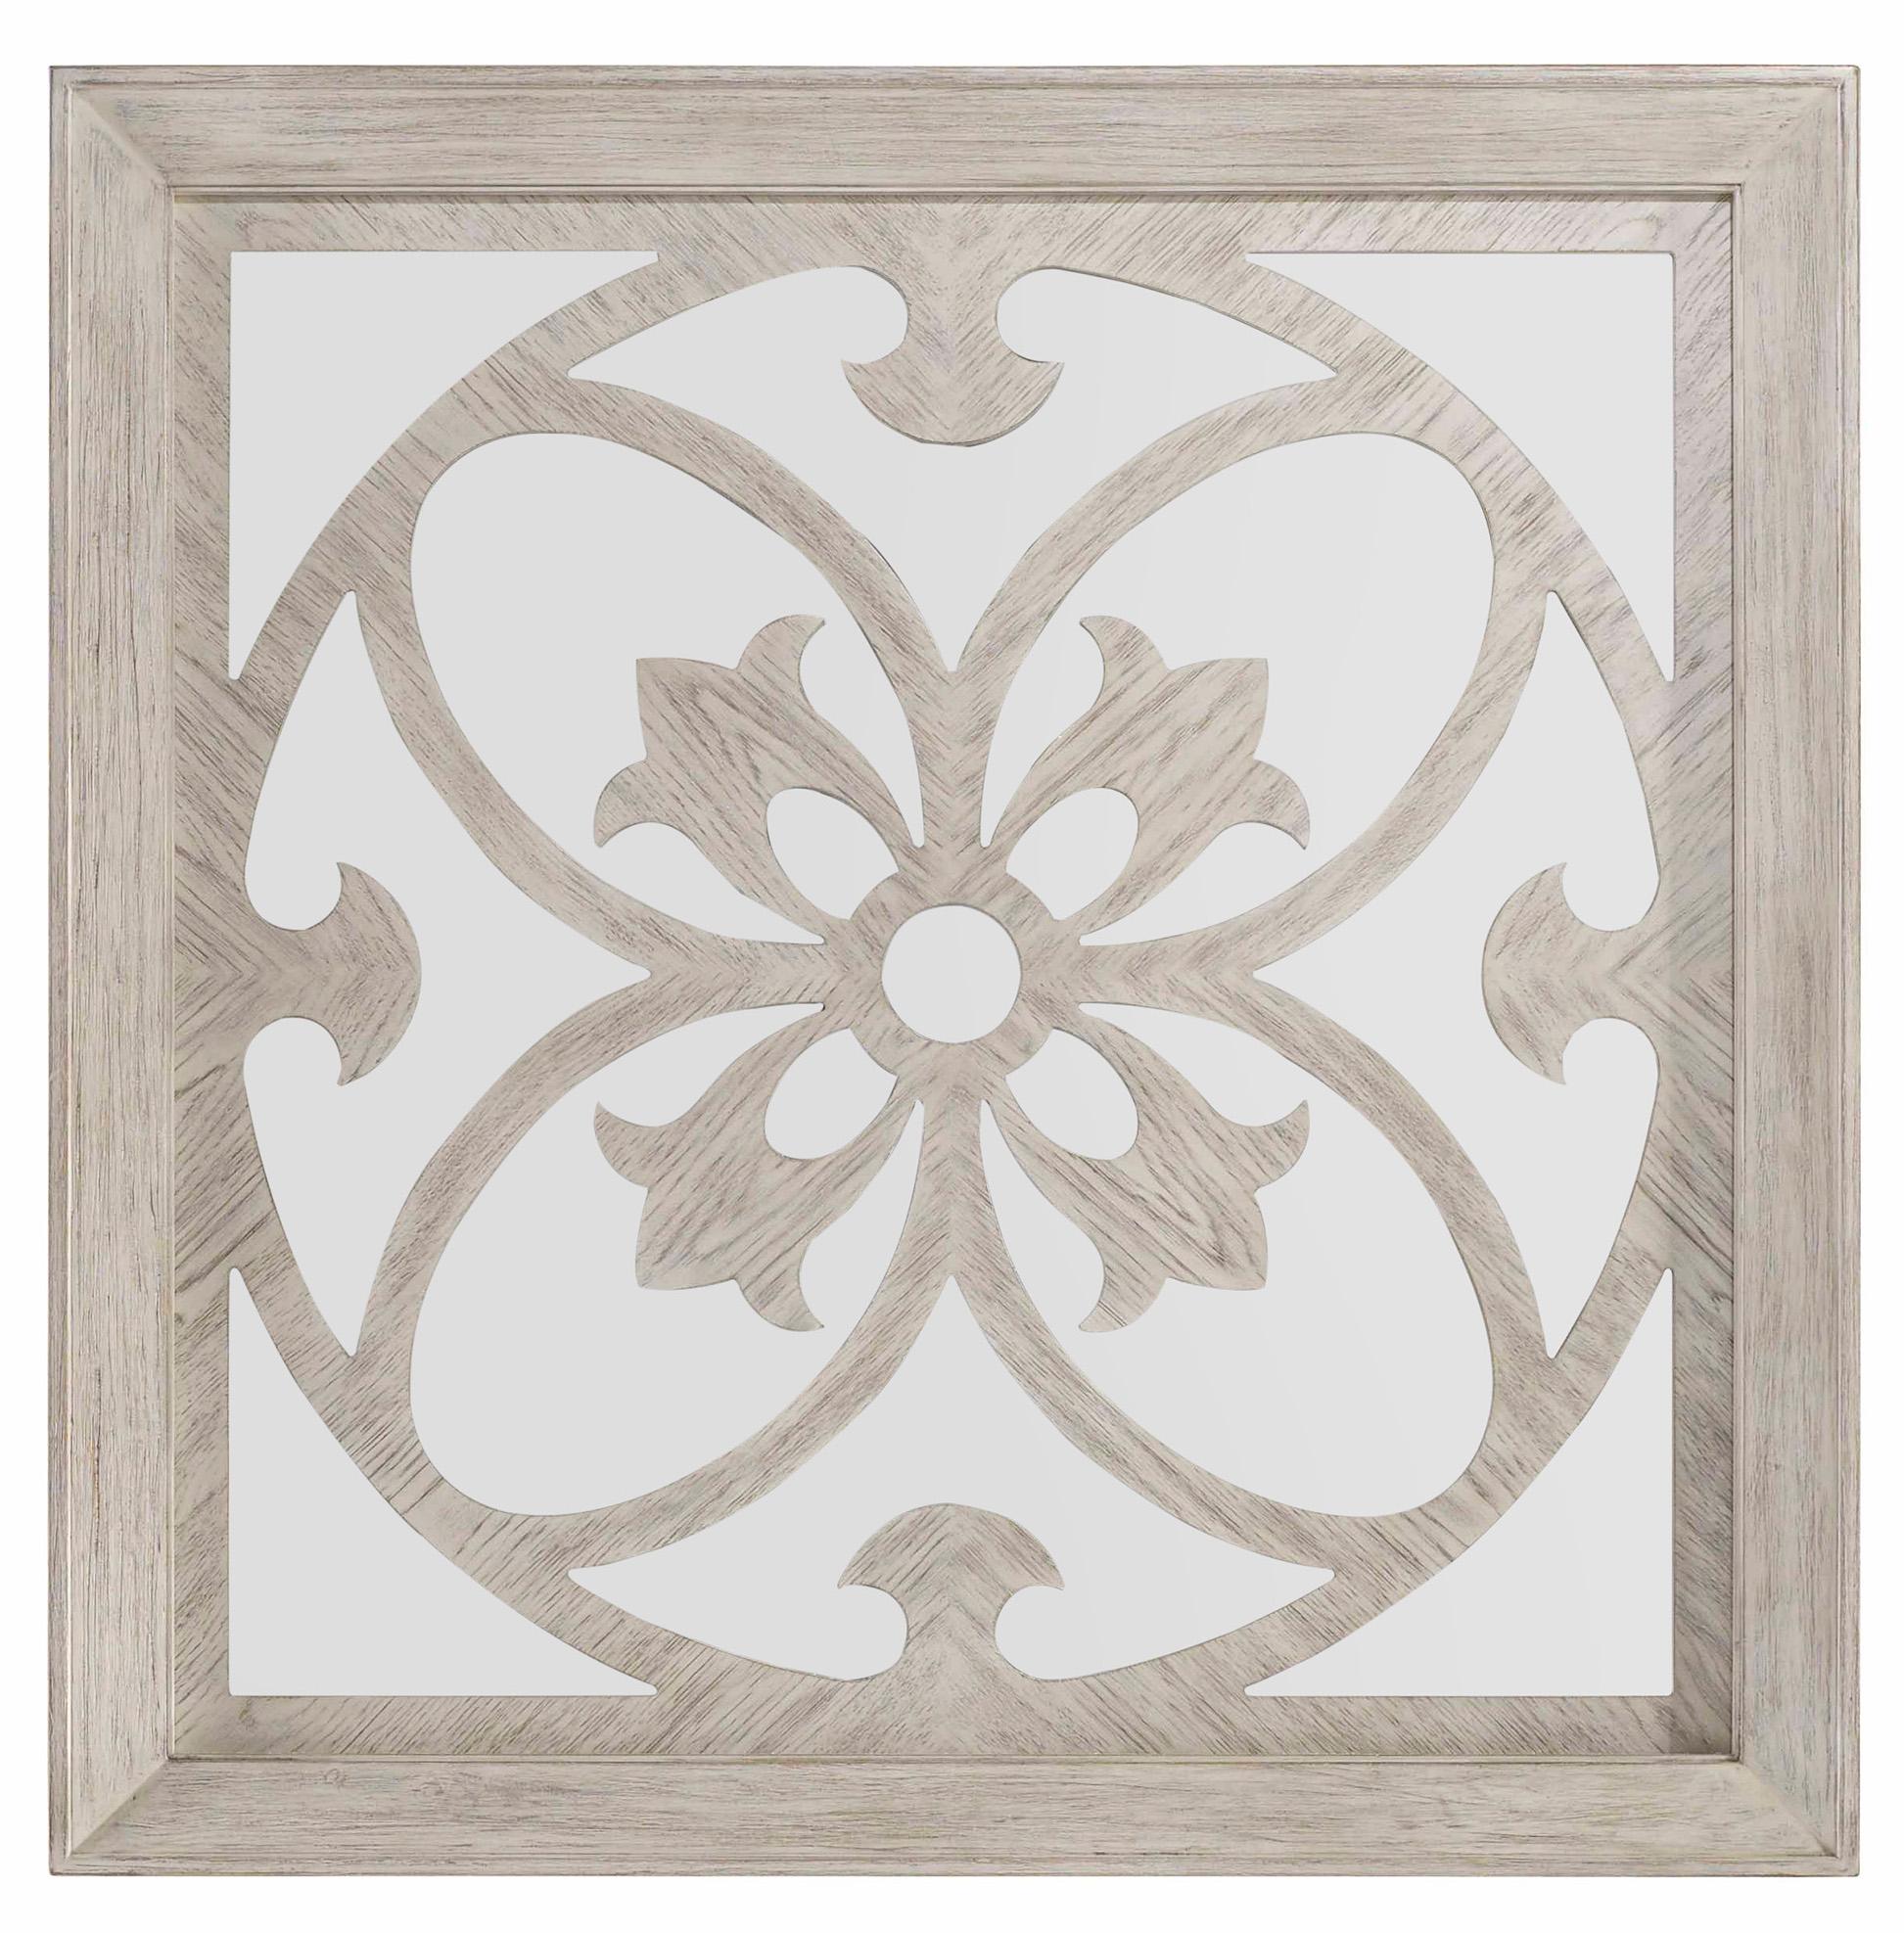 Hooker Furniture Sunset Point Decorative Square Mirror - Item Number: 5325-50004